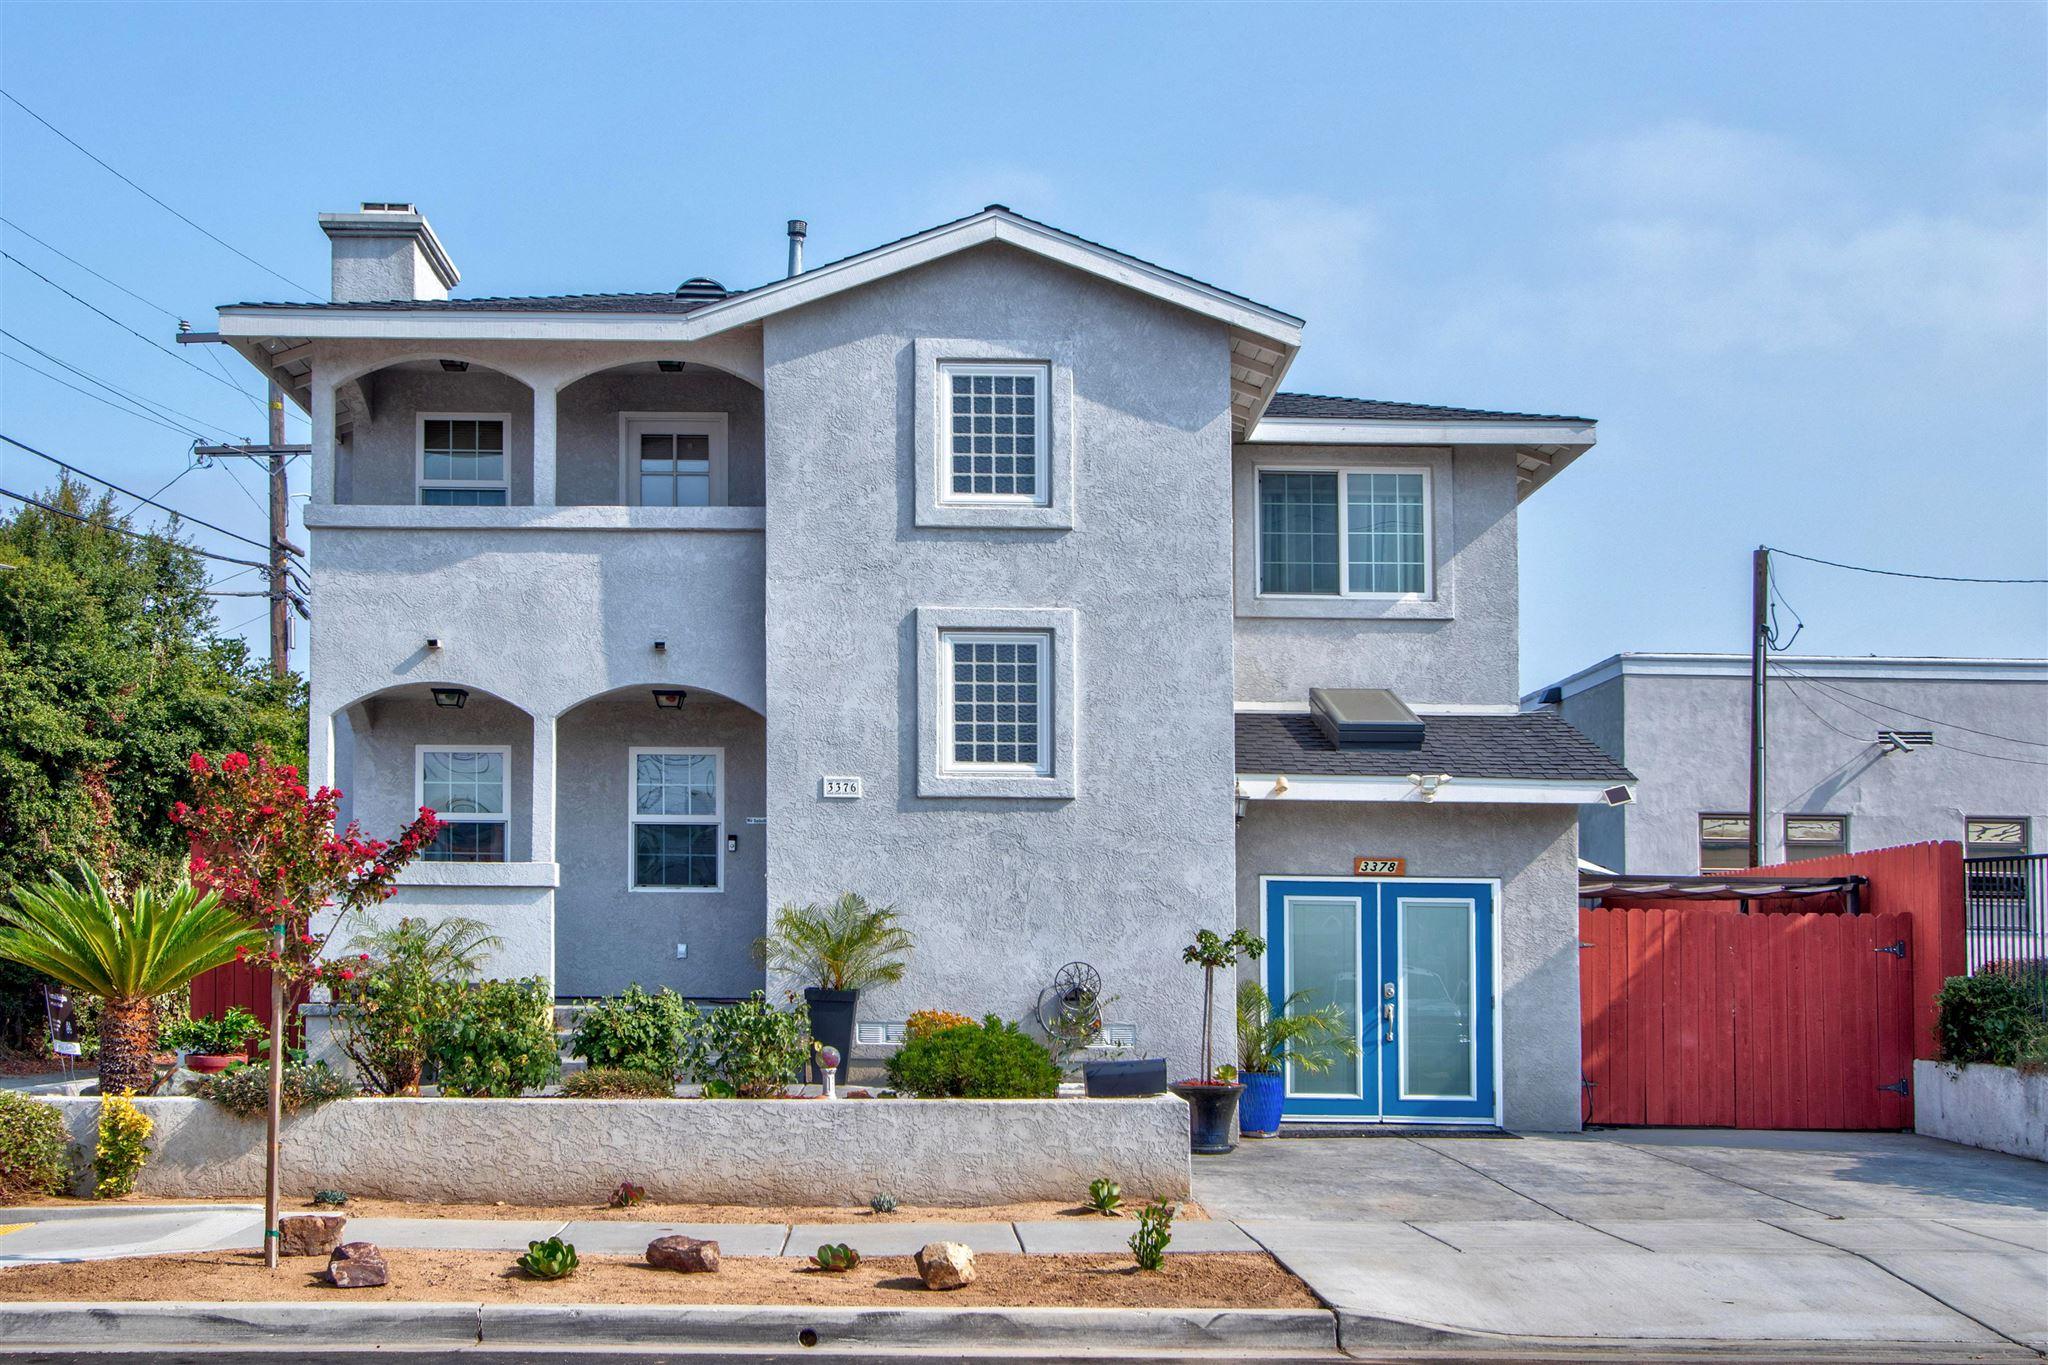 3376 Madison Ave, San Diego CA 92116